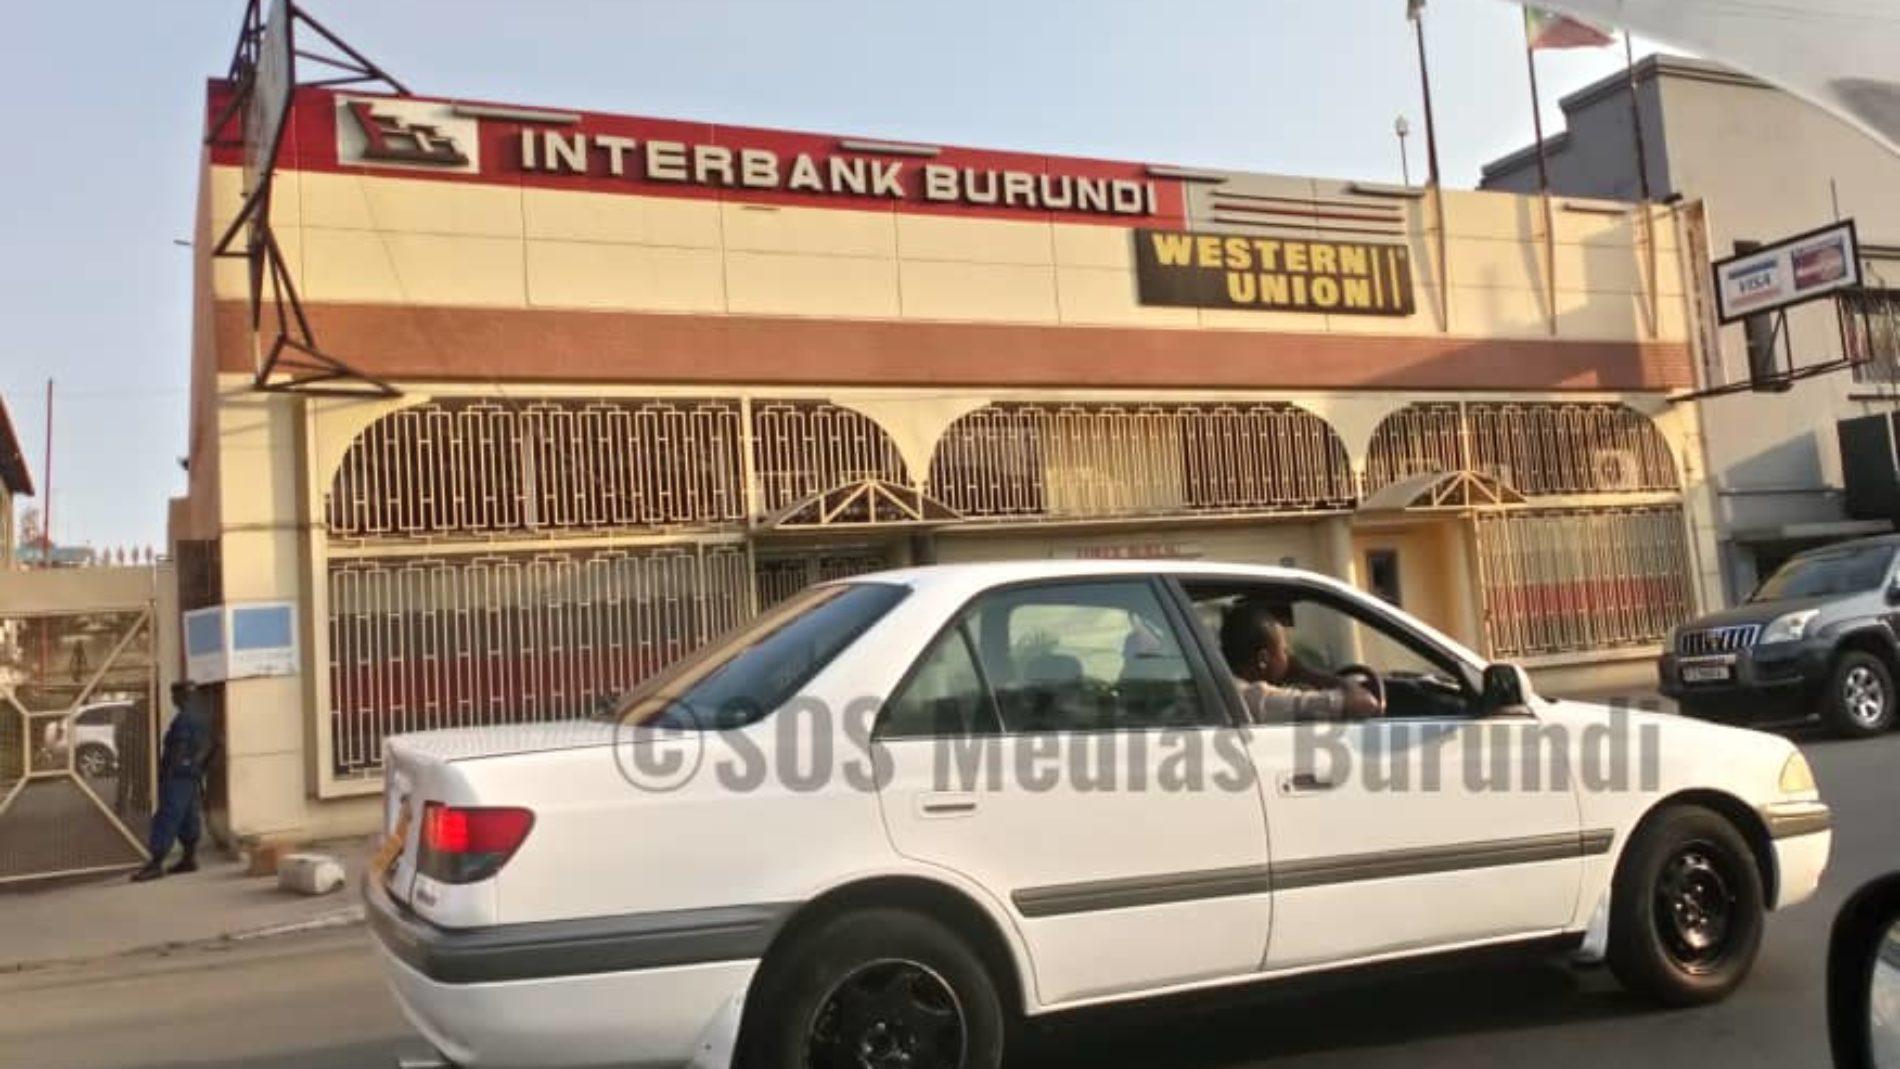 l'Interbank Burundi accusée de financer les rebelles basés au Congo